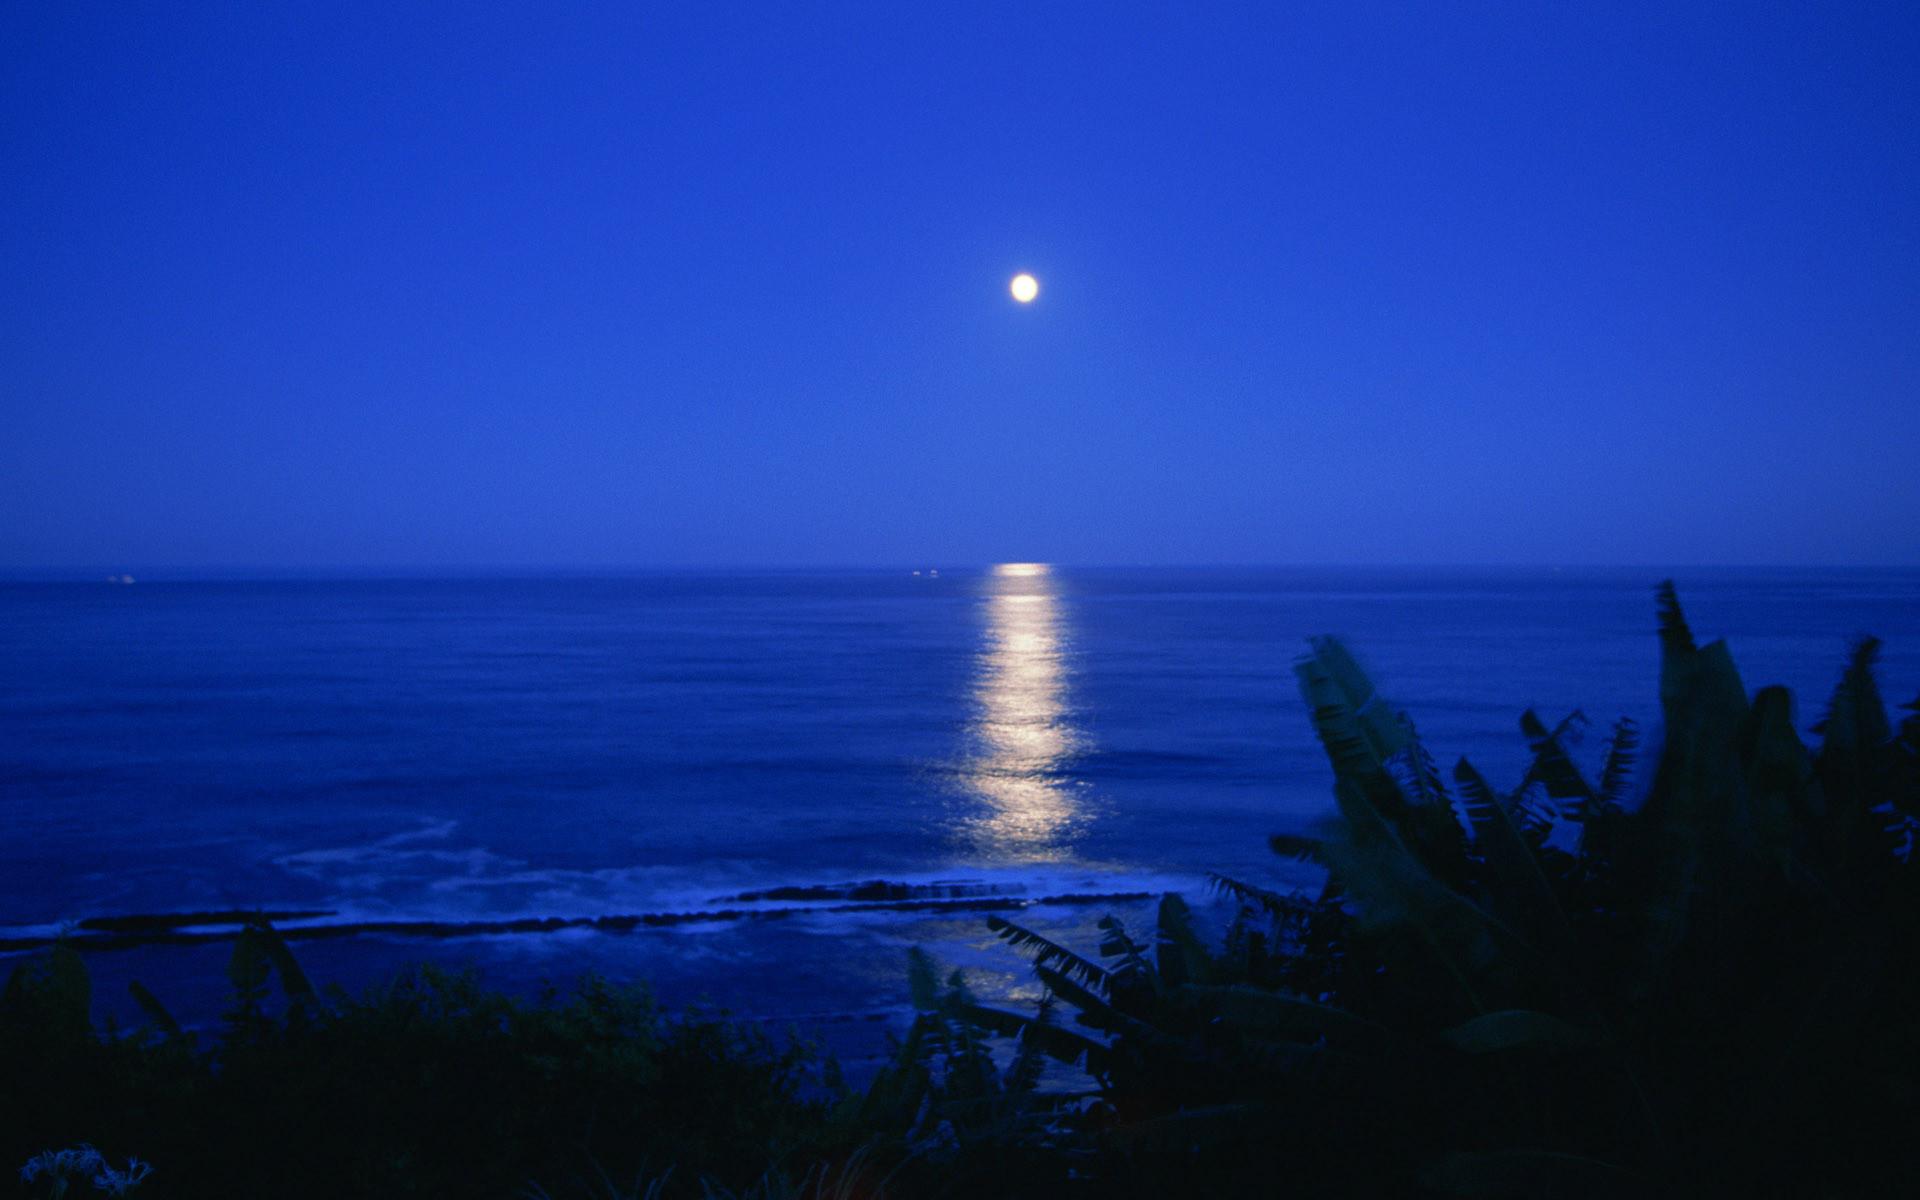 Night sea moon ocean reflection wallpaper     135940   WallpaperUP